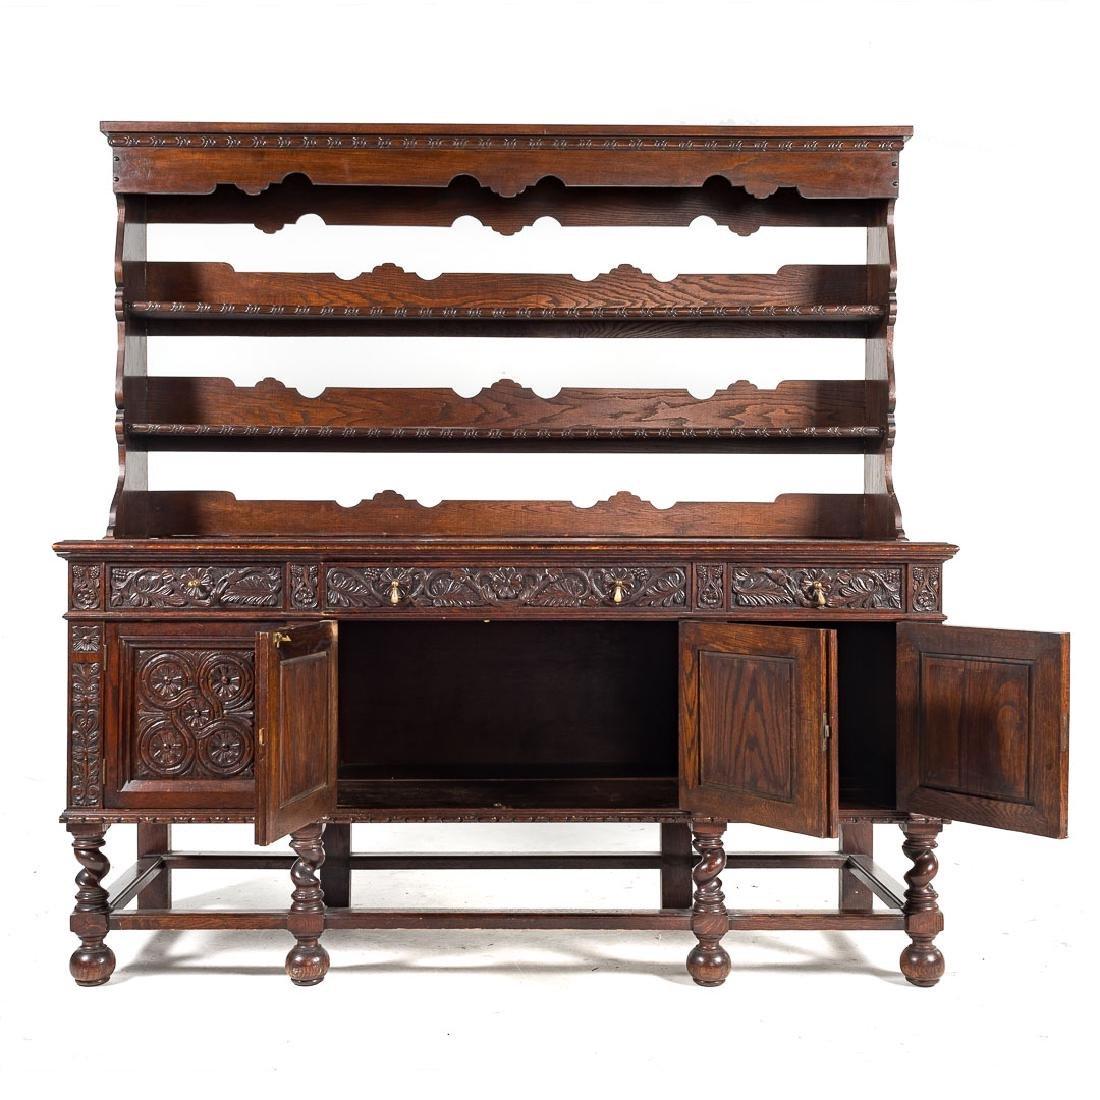 Jacobean Revival style carved oak dresser, - 3